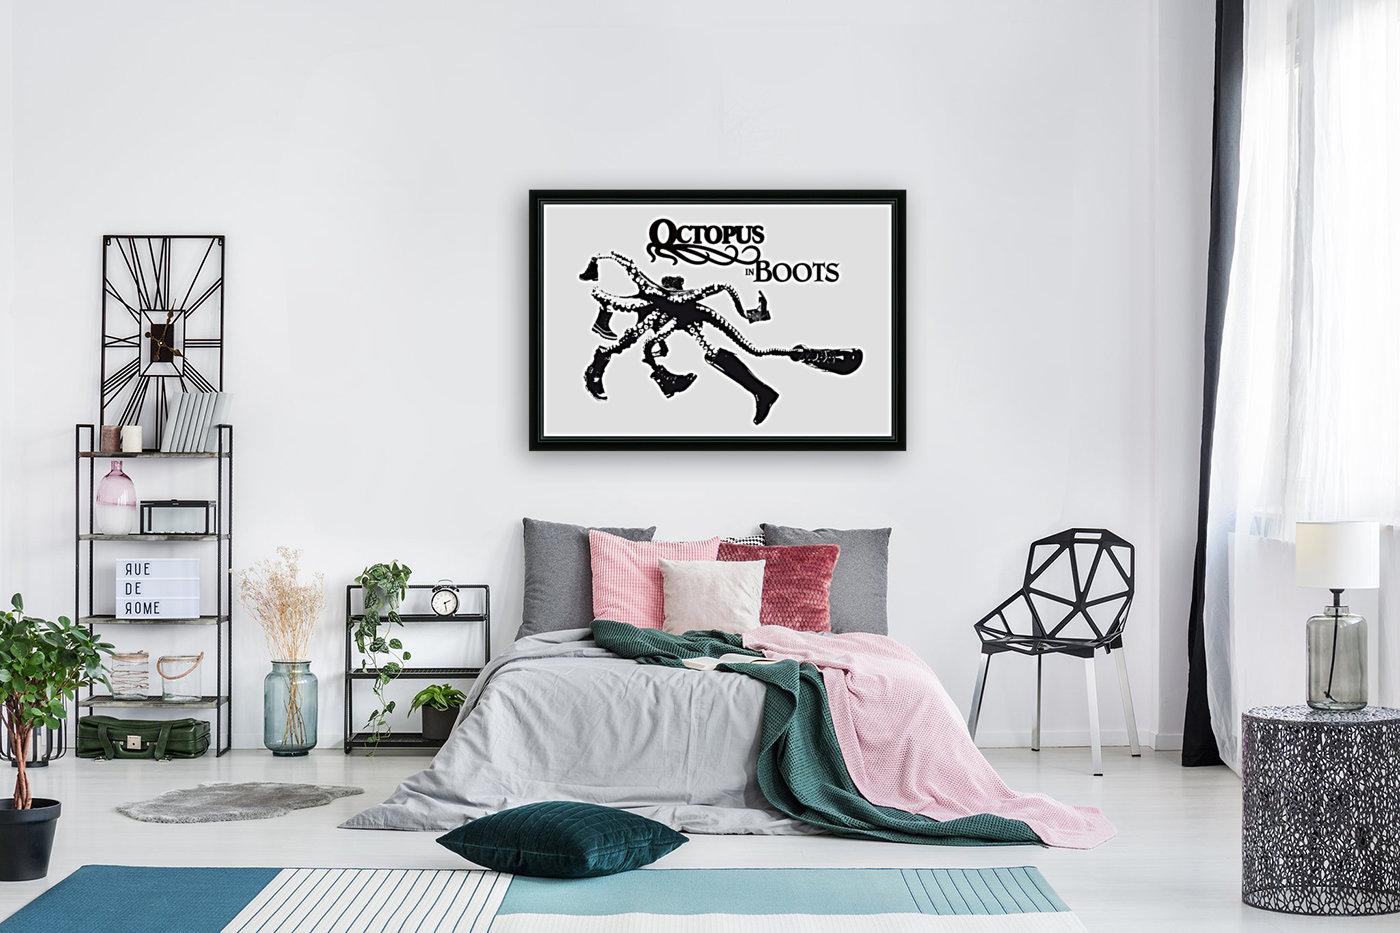 Octopus in Boots  Art